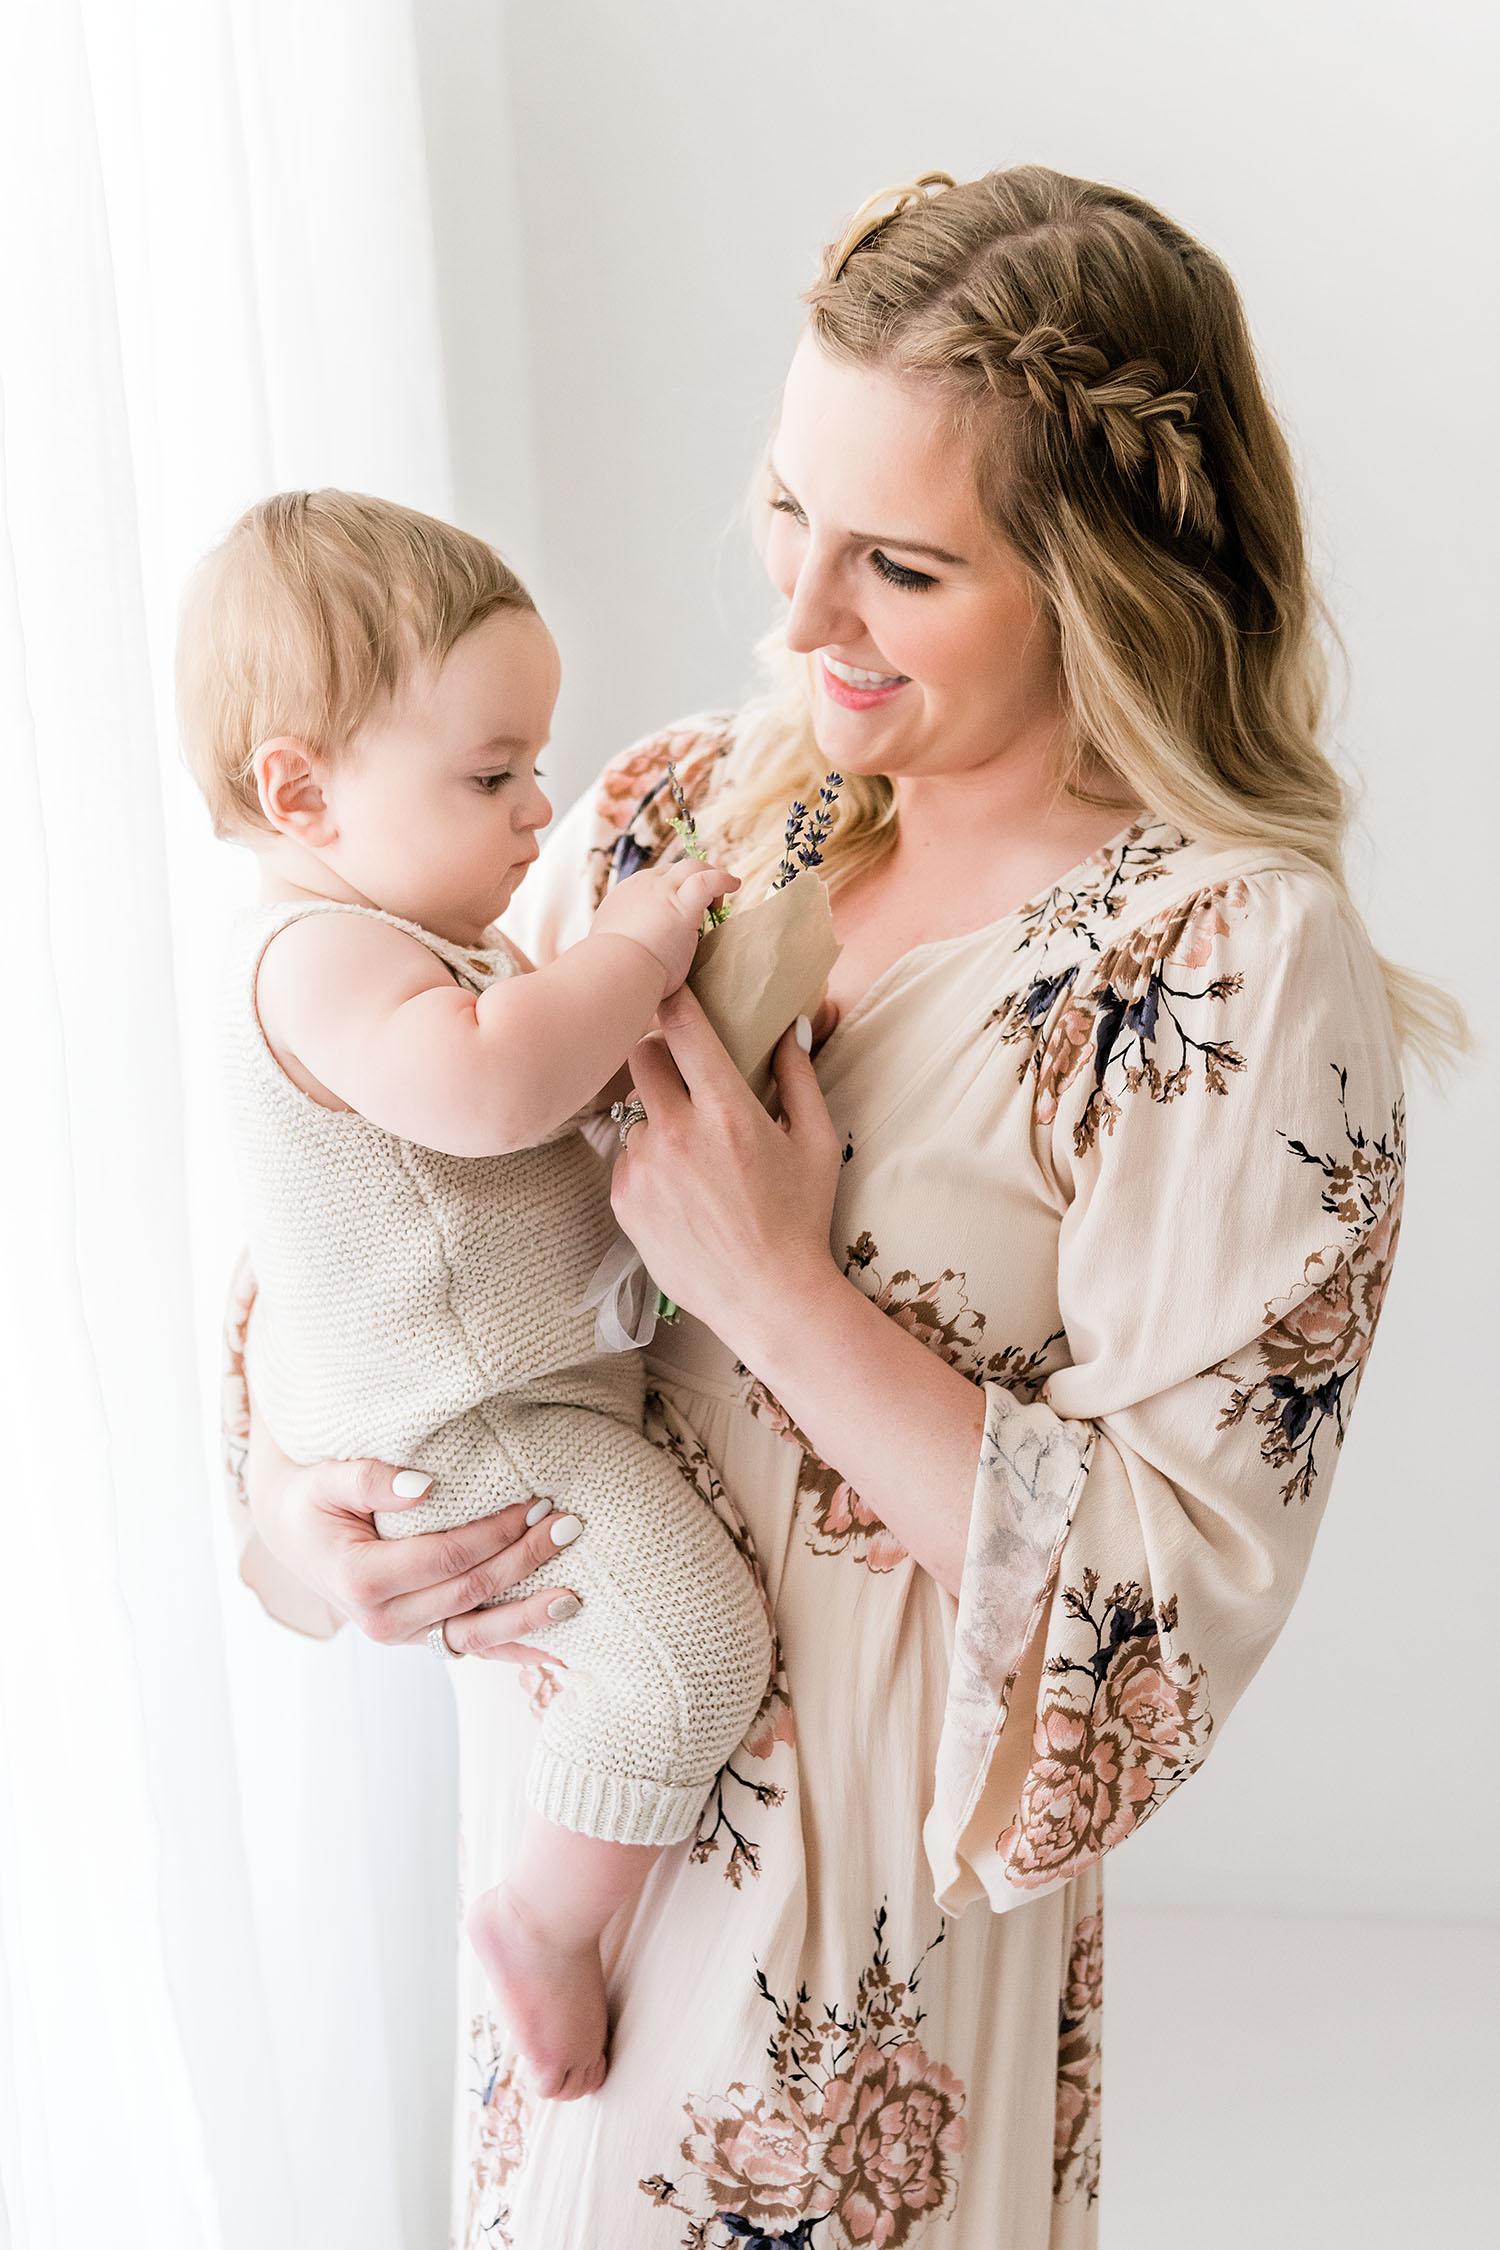 2019_Motherhood Event_Jessica Miller_10 copy.jpg